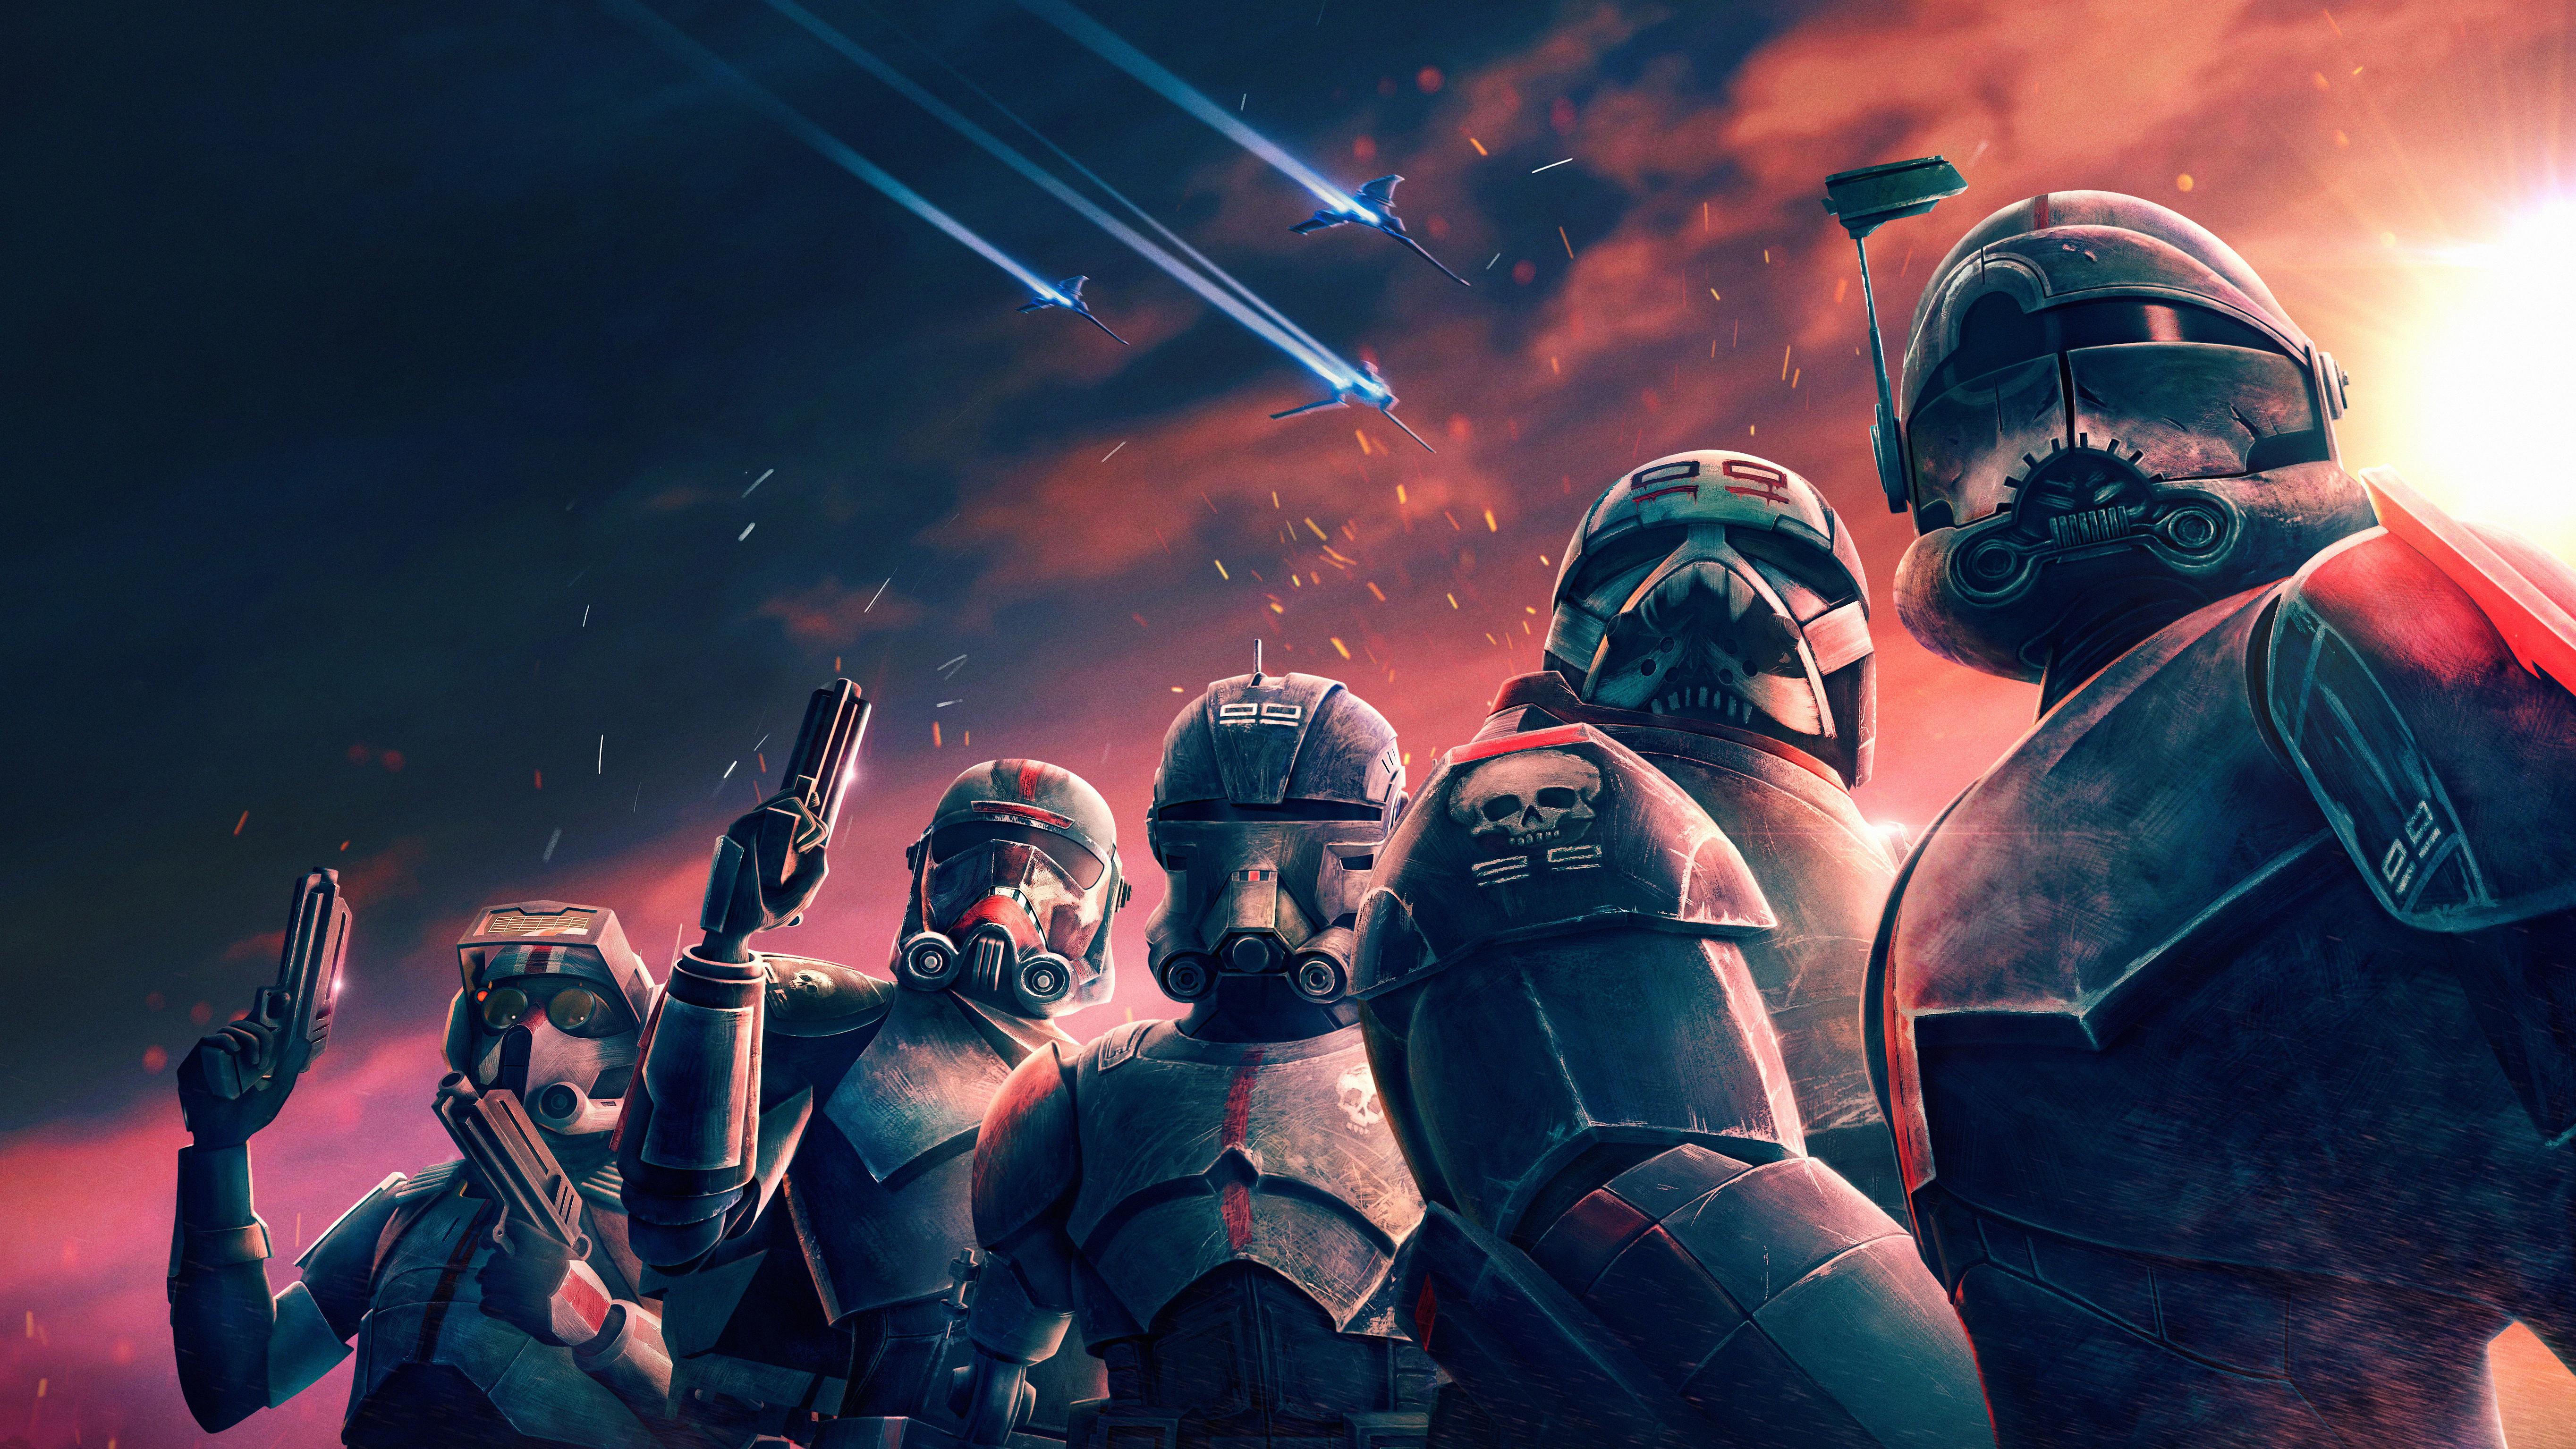 Star Wars The Bad Batch Wallpaper 4k Tv Series Season 1 2021 5k Movies 5123